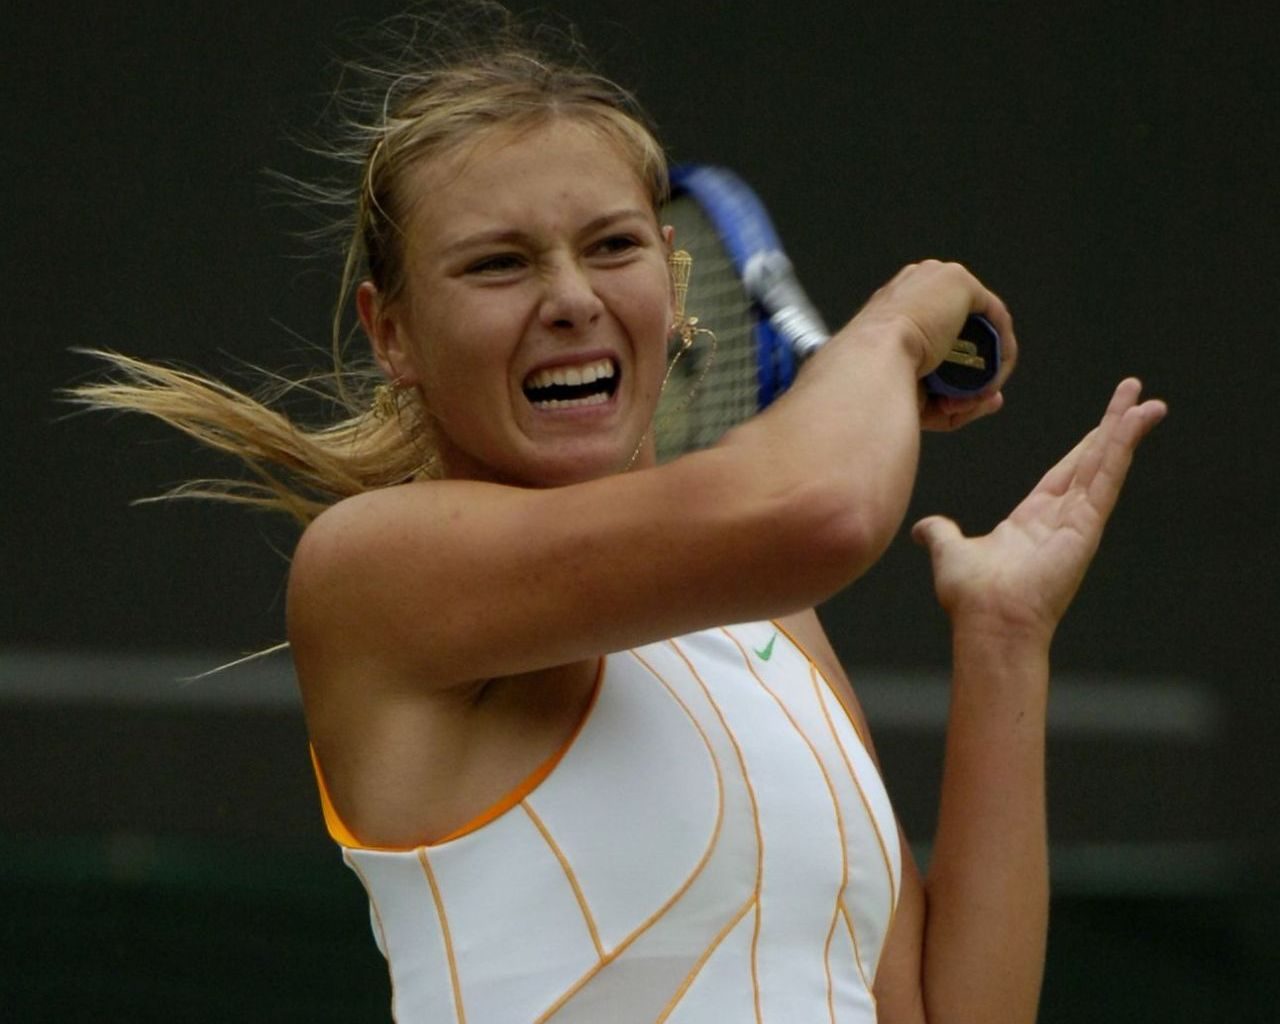 maria_sharapova_tennis_1280x1024